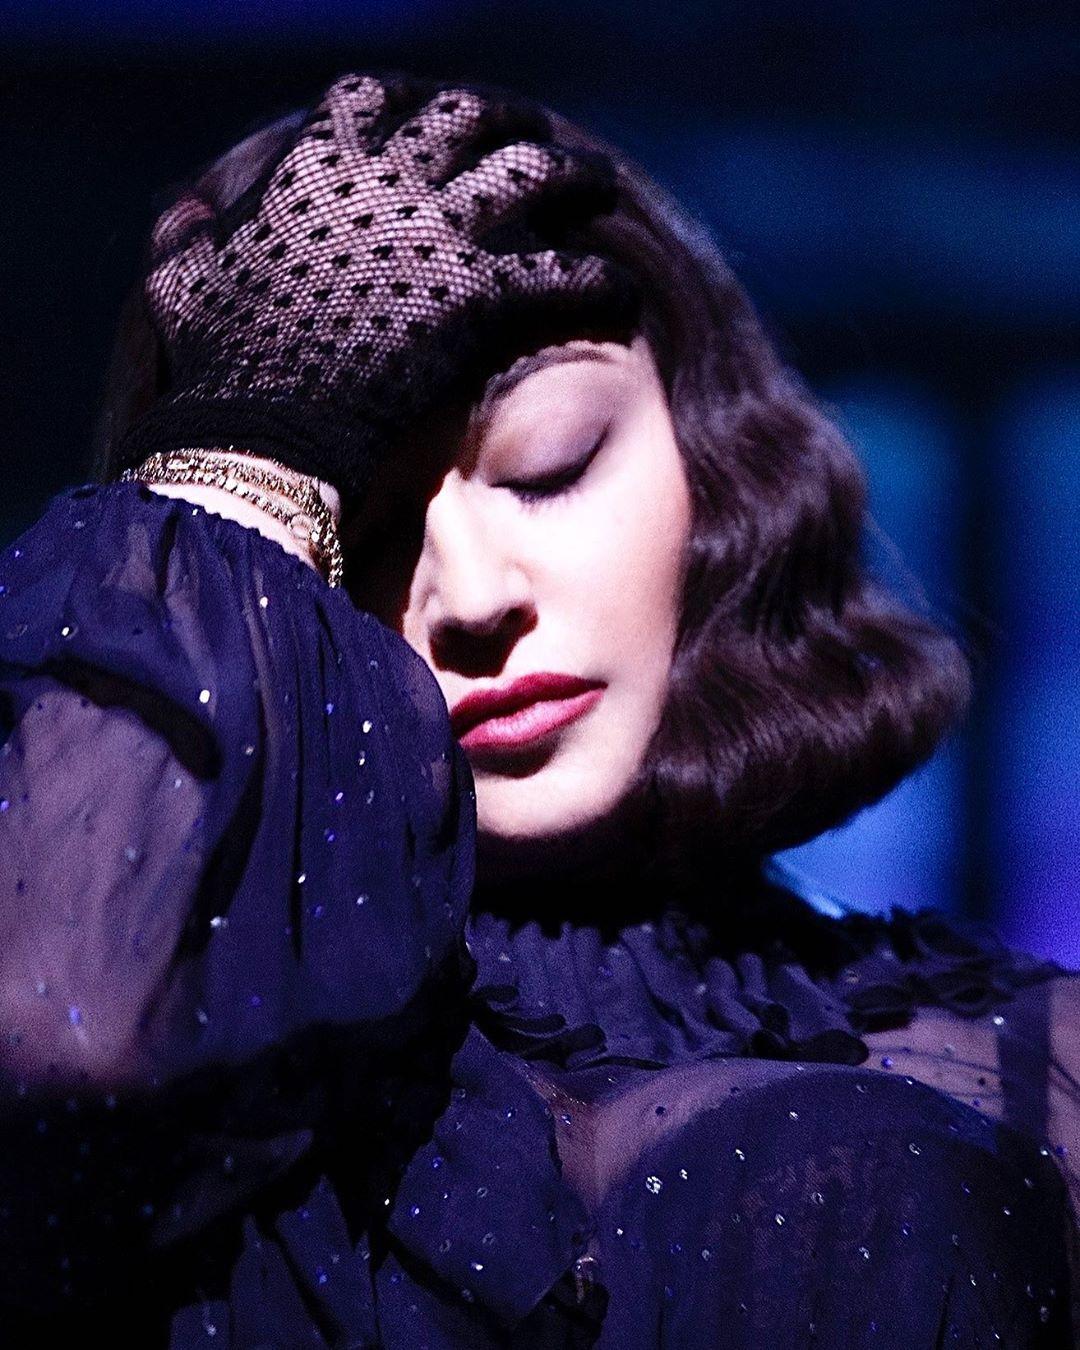 Fans μήνυσαν την Madonna για αργοπορία στις συναυλίες